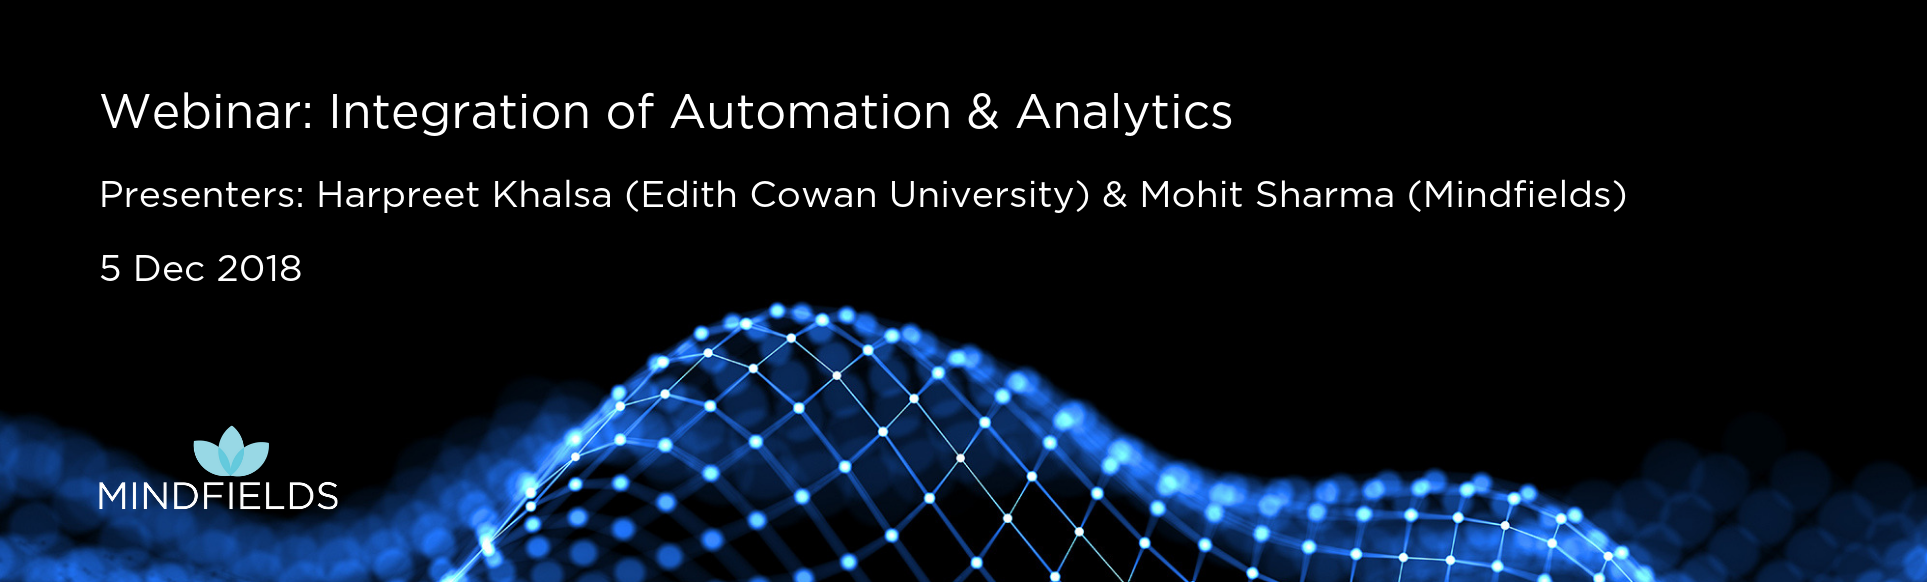 Webinar - Automation & Analytics LP